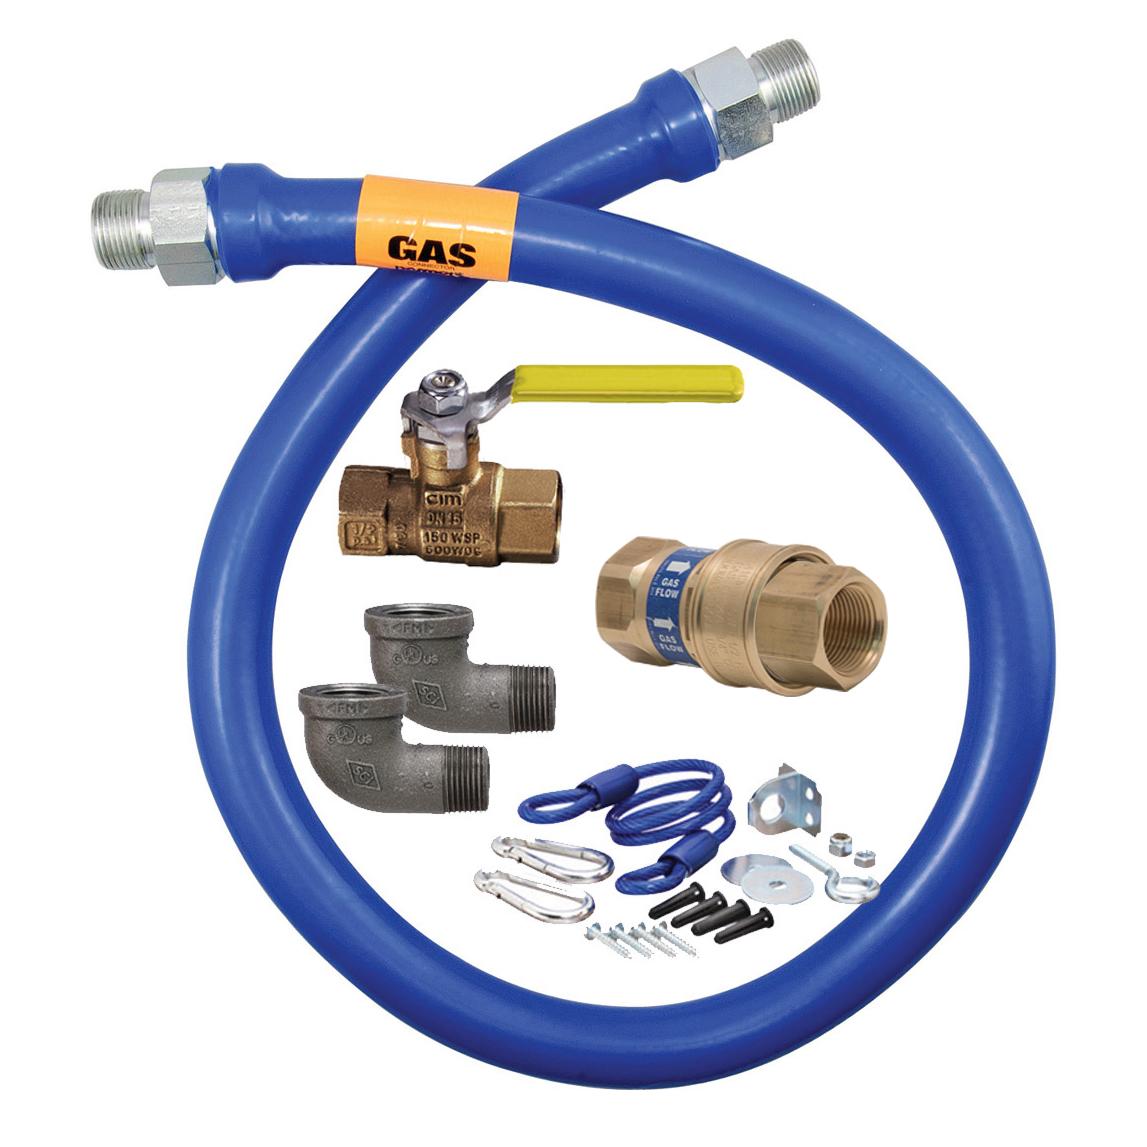 Dormont Manufacturing 1675KITB2S48 gas connector hose kit